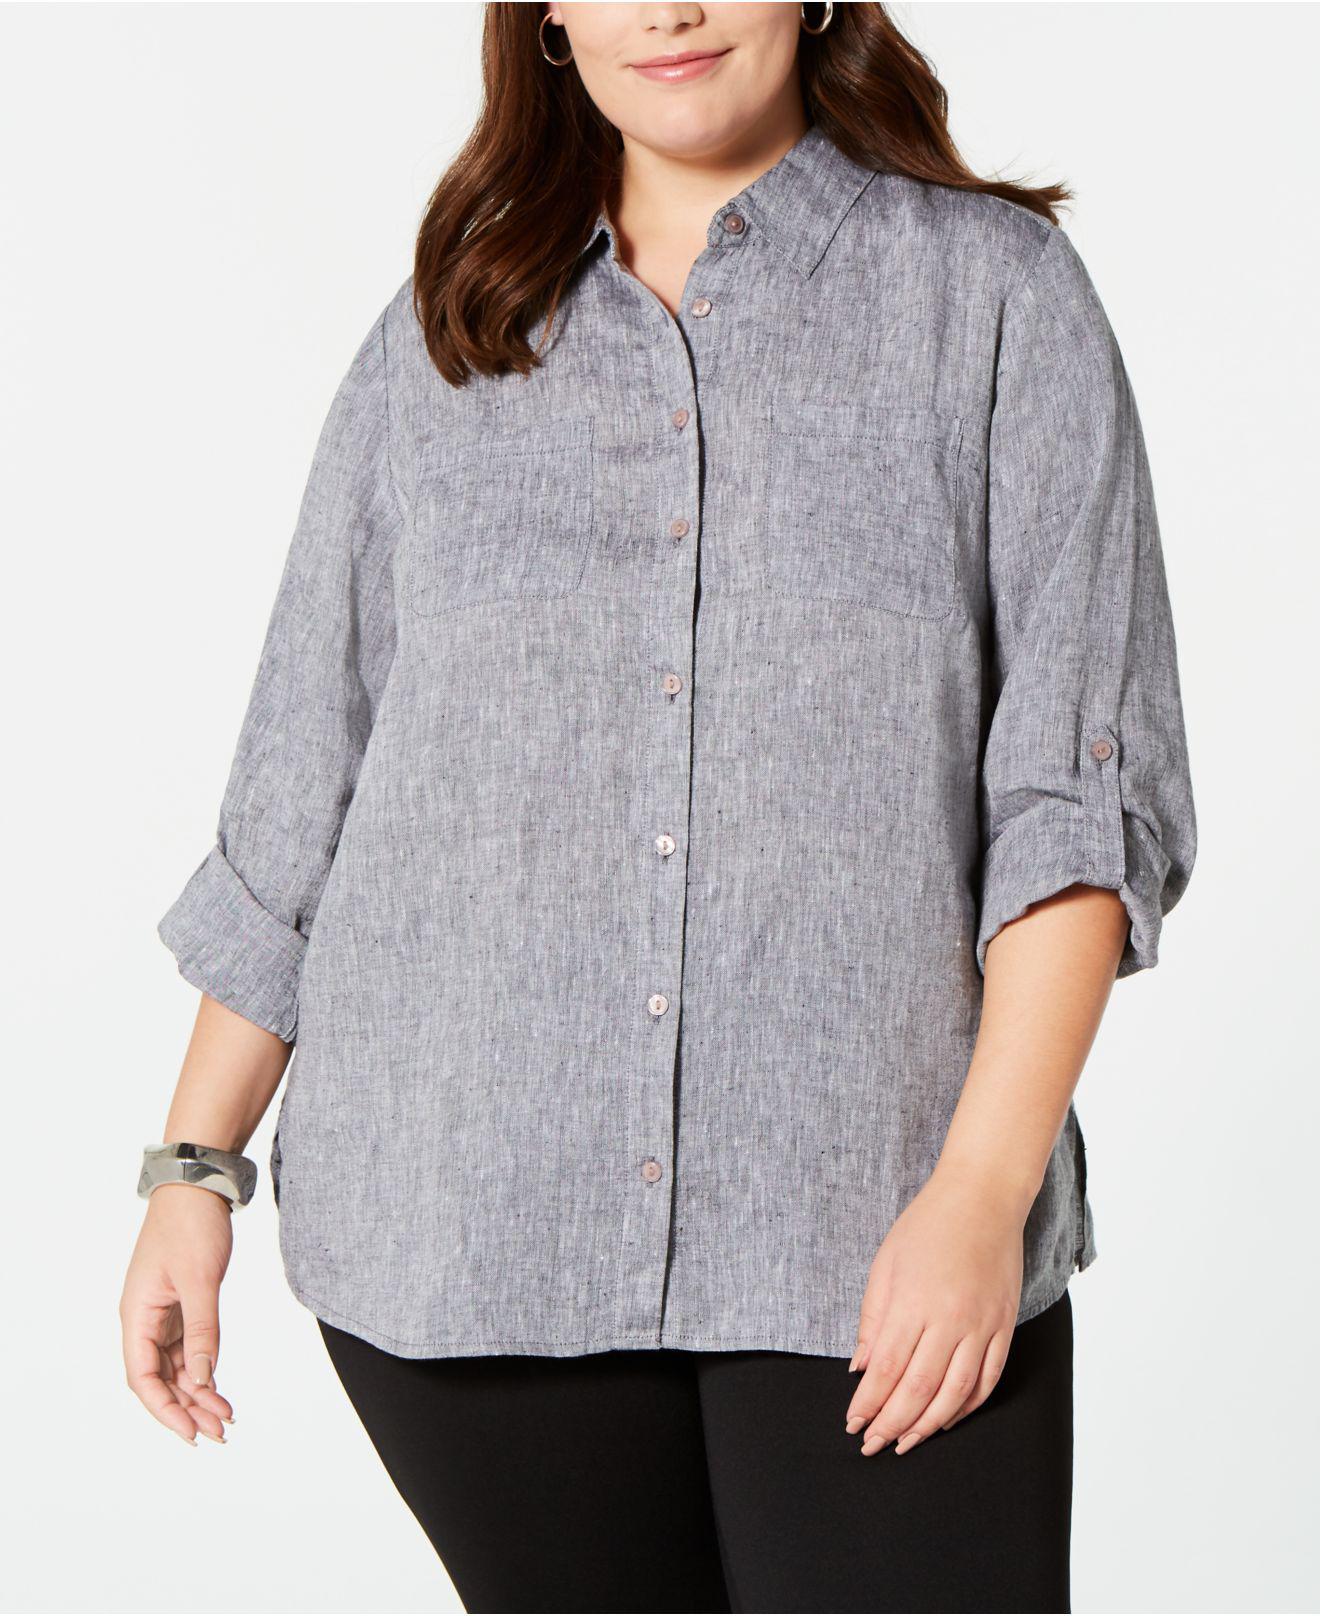 be44a5a65f5 Charter Club. Women s Gray Plus Size Linen Utility Shirt ...